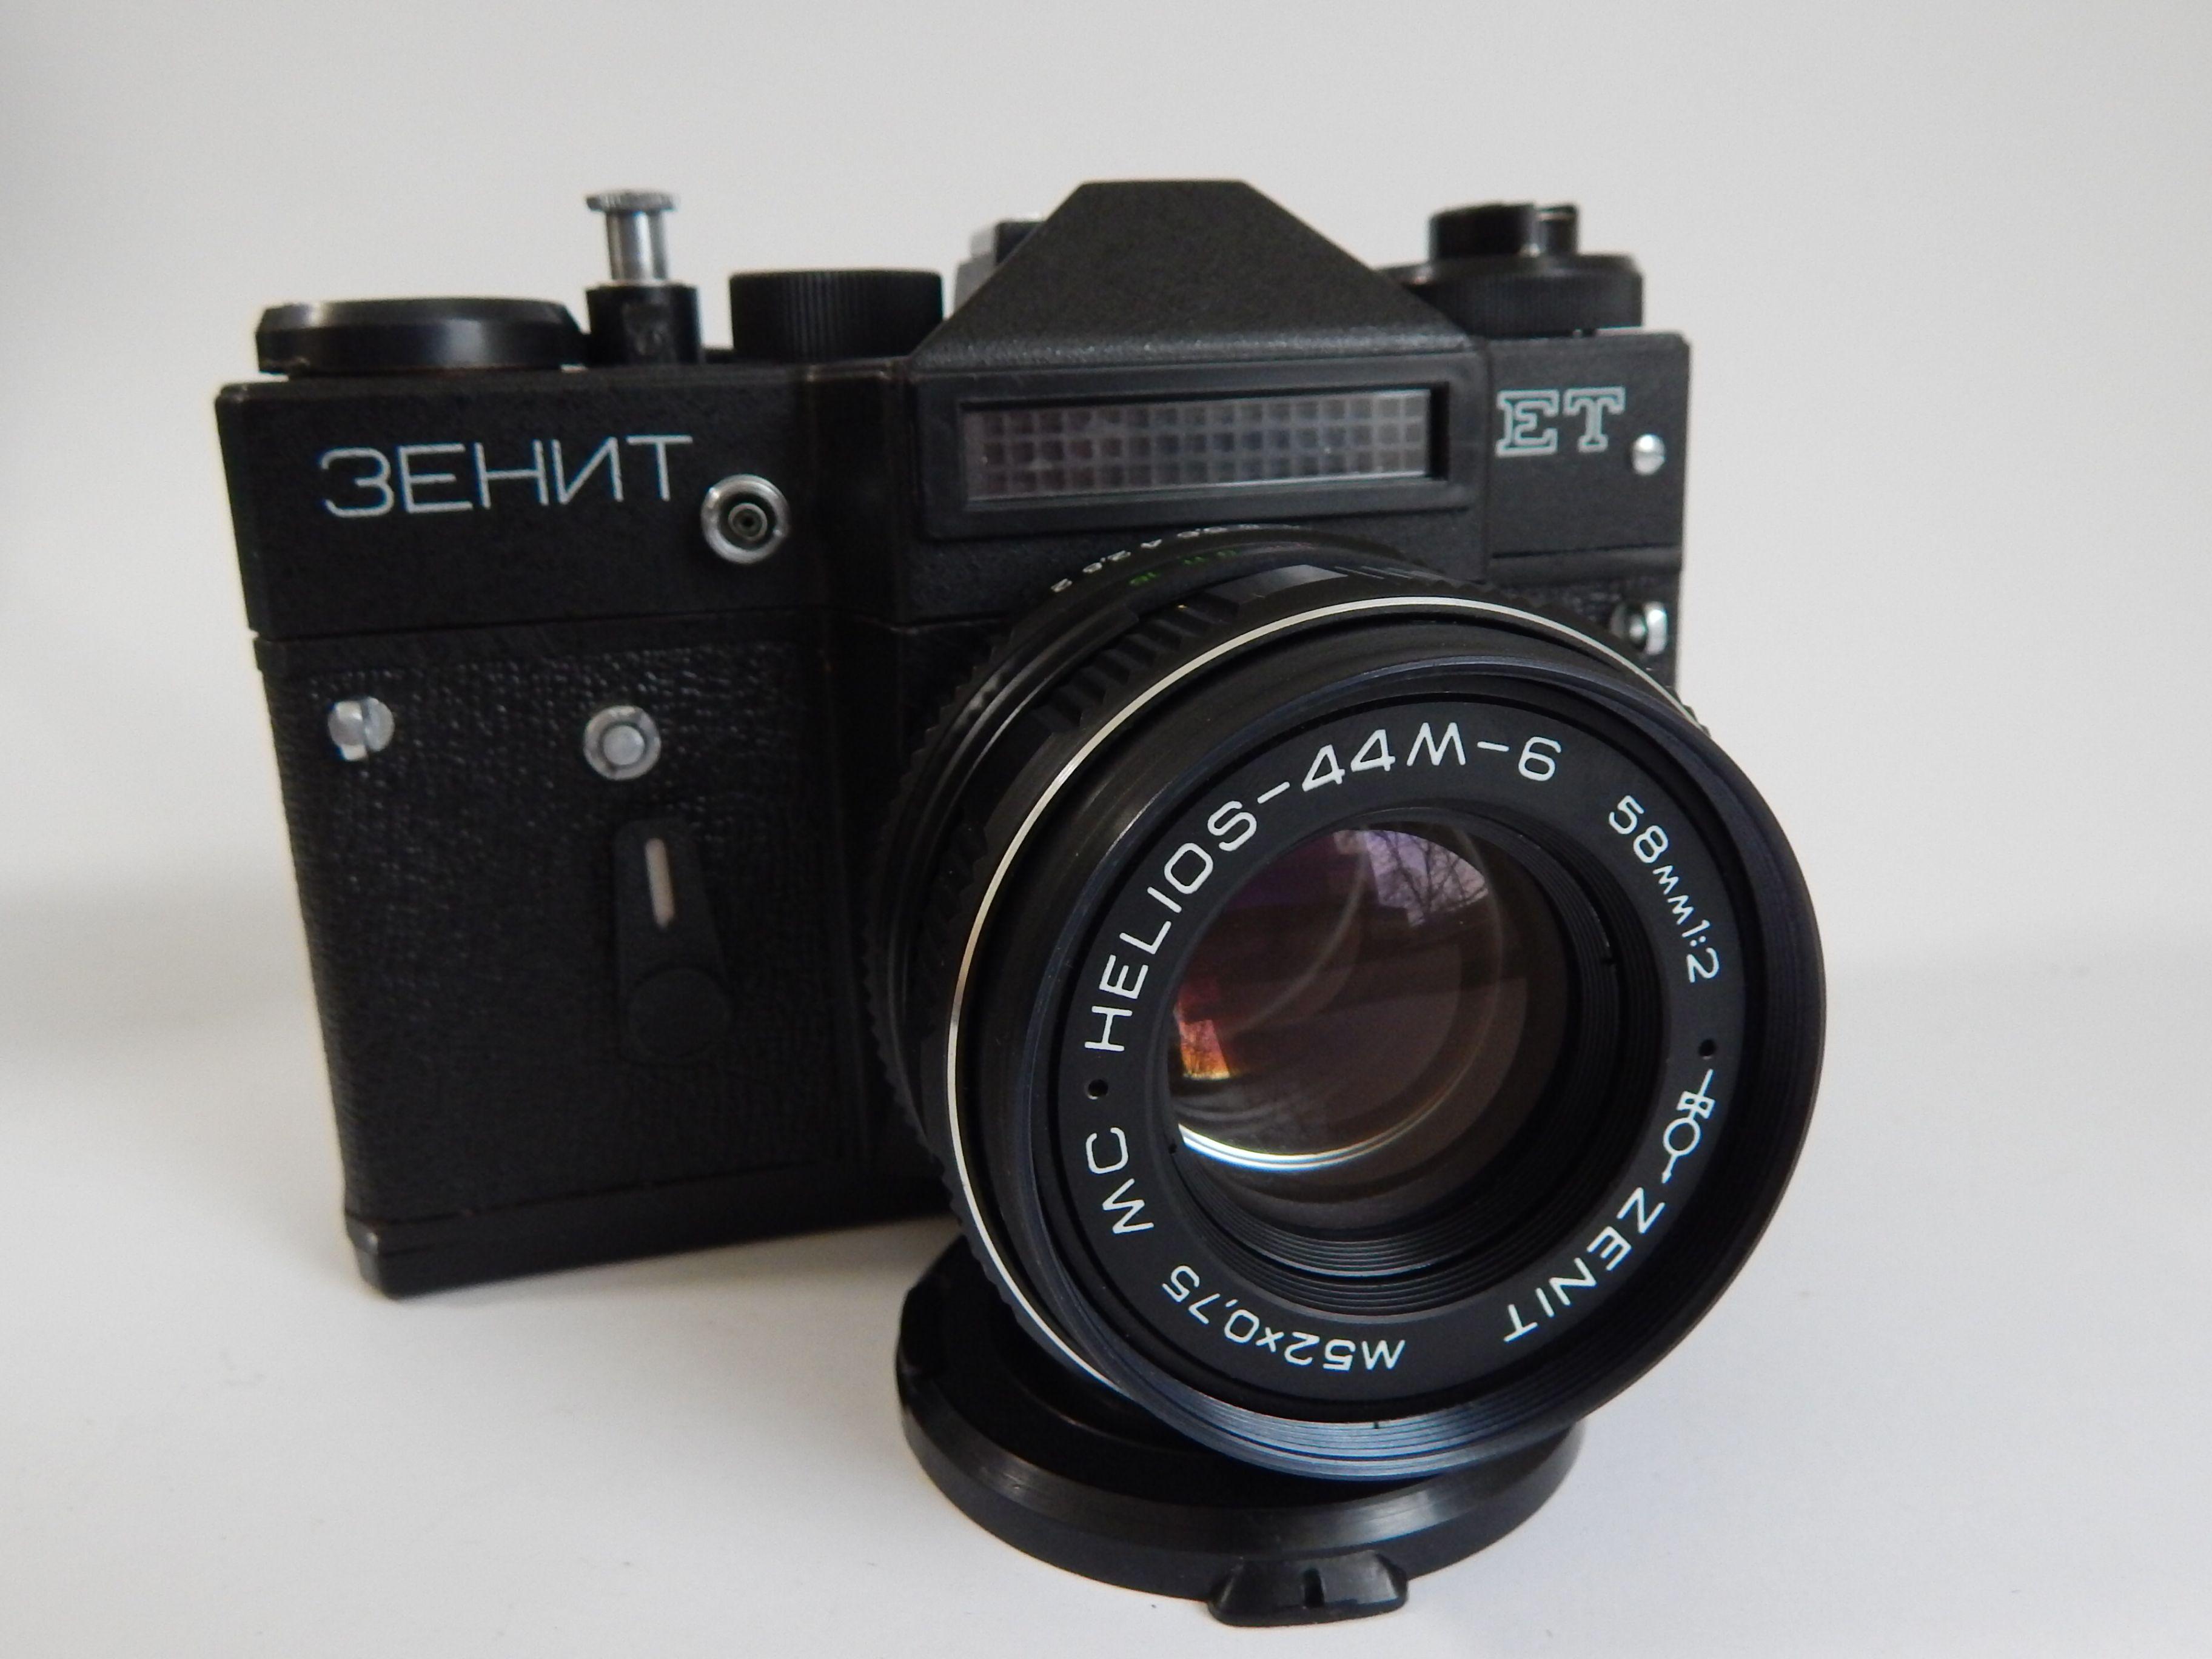 Camera Zenit Et Ussr Soviet 35mm Slr M42 Lens Ms Helios 44m 6 F2 58mm